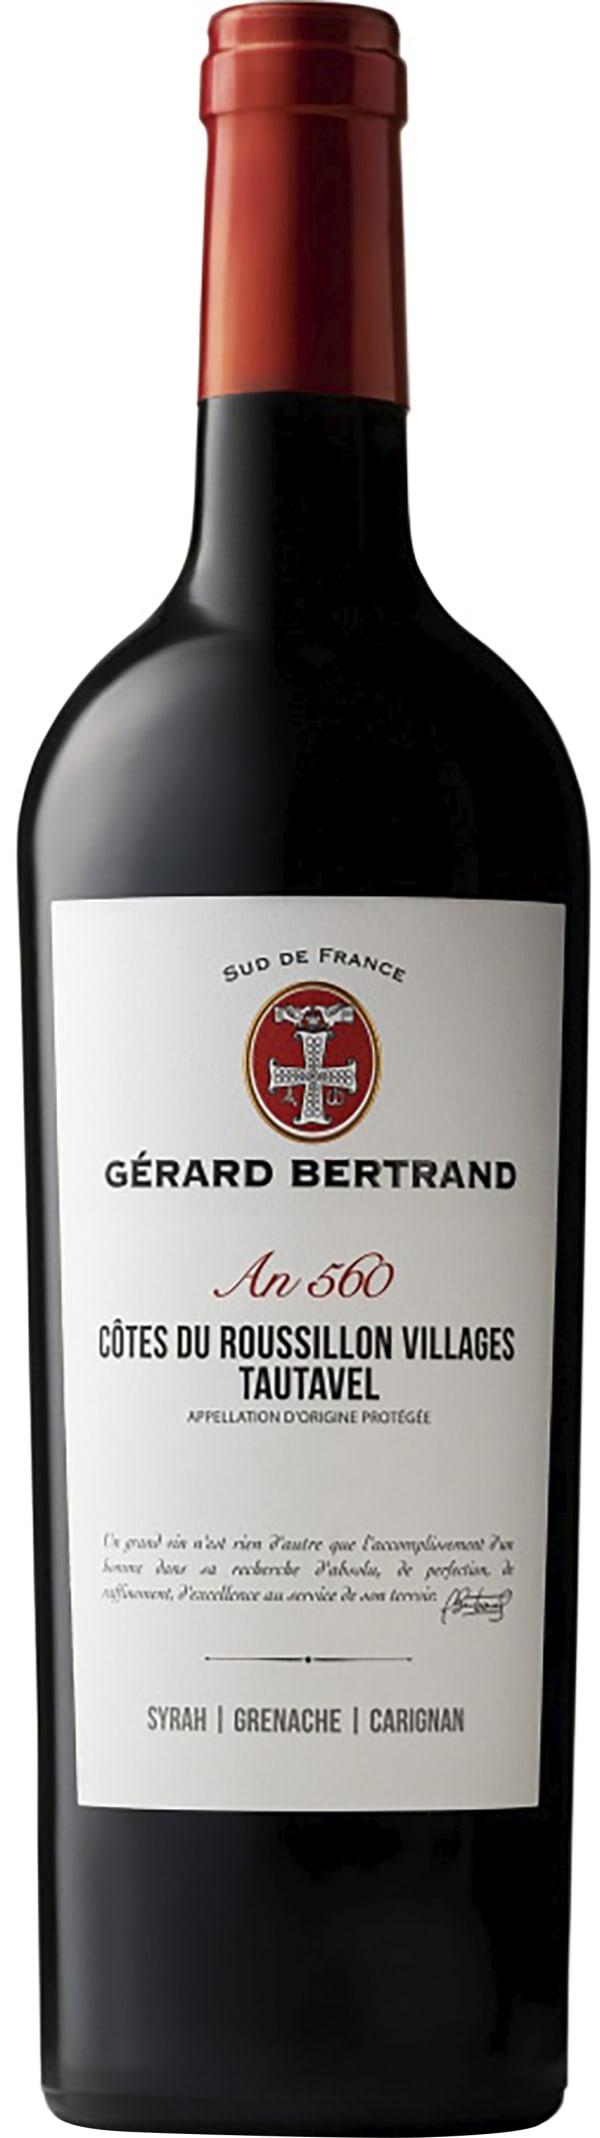 Gérard Bertrand Grand Terroir Tautavel 2013